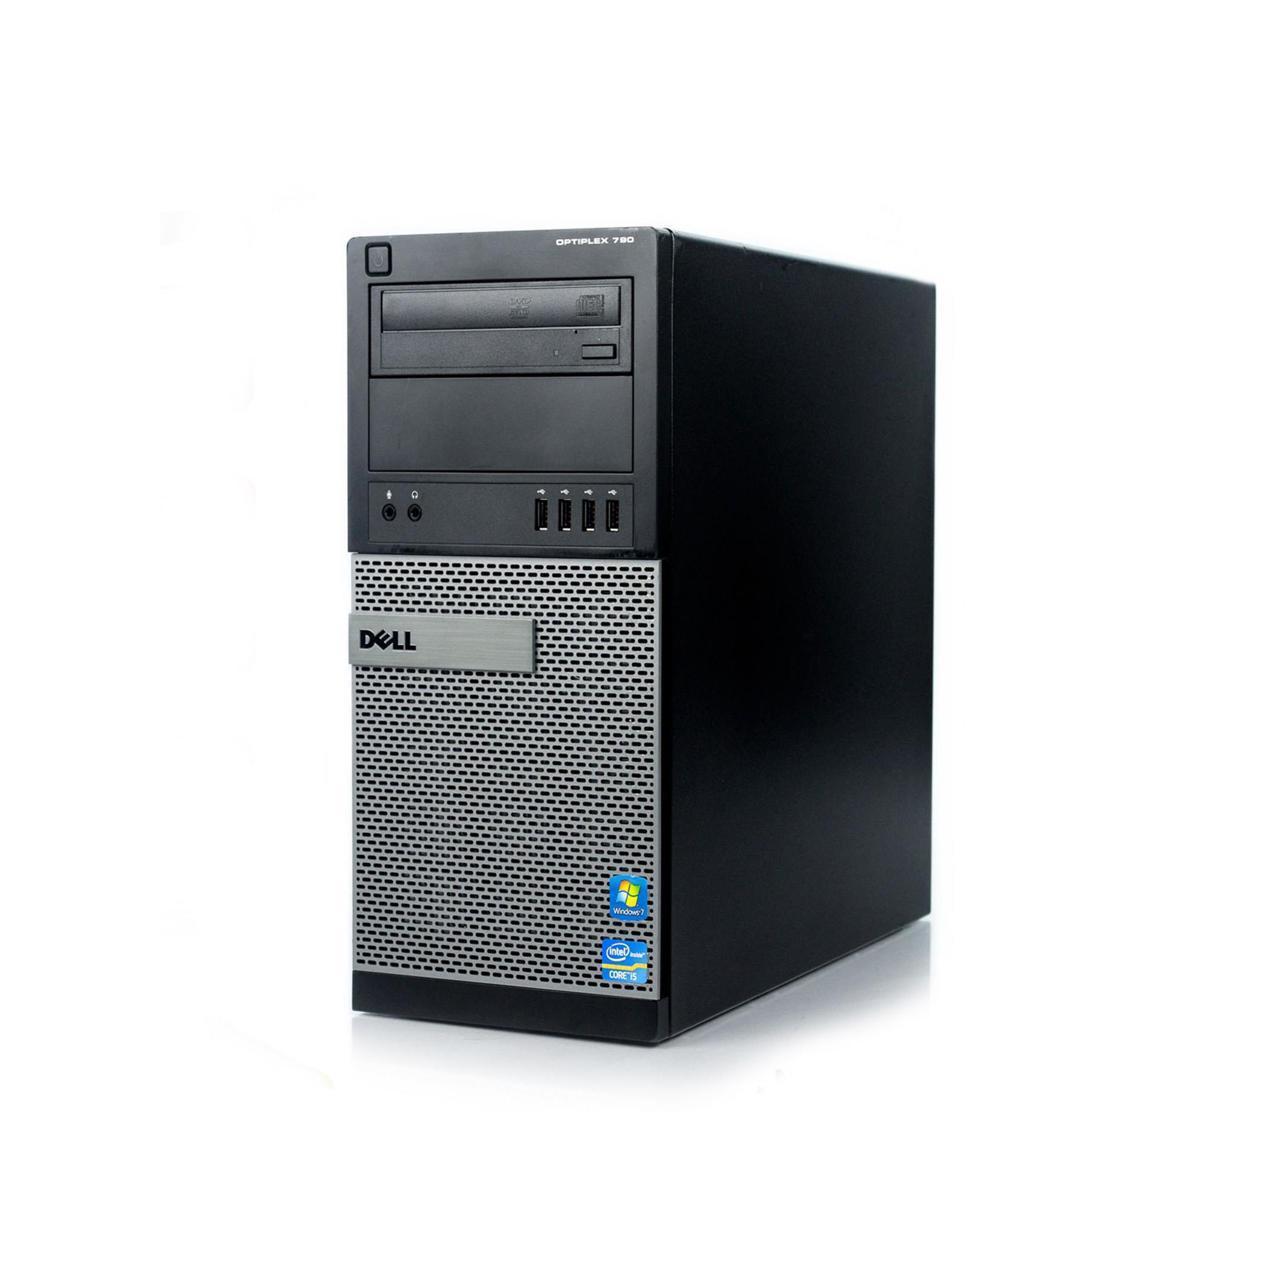 Dell Optiplex 790 MT Core i5 3.1 GHz GHz - HDD 1 TB RAM 8GB